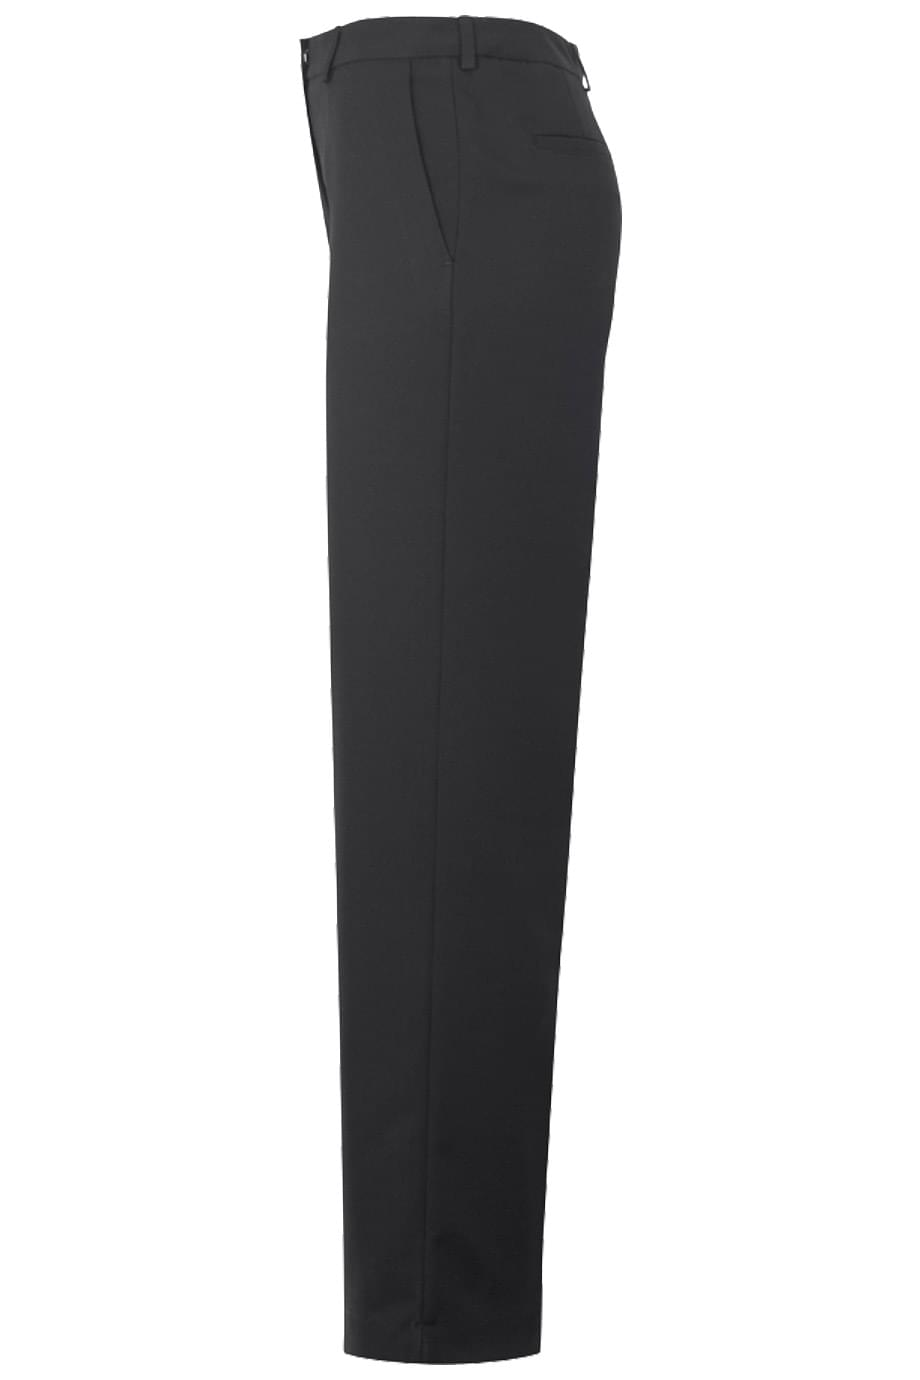 REDWOOD & ROSS® SYNERGY DRESS PANT